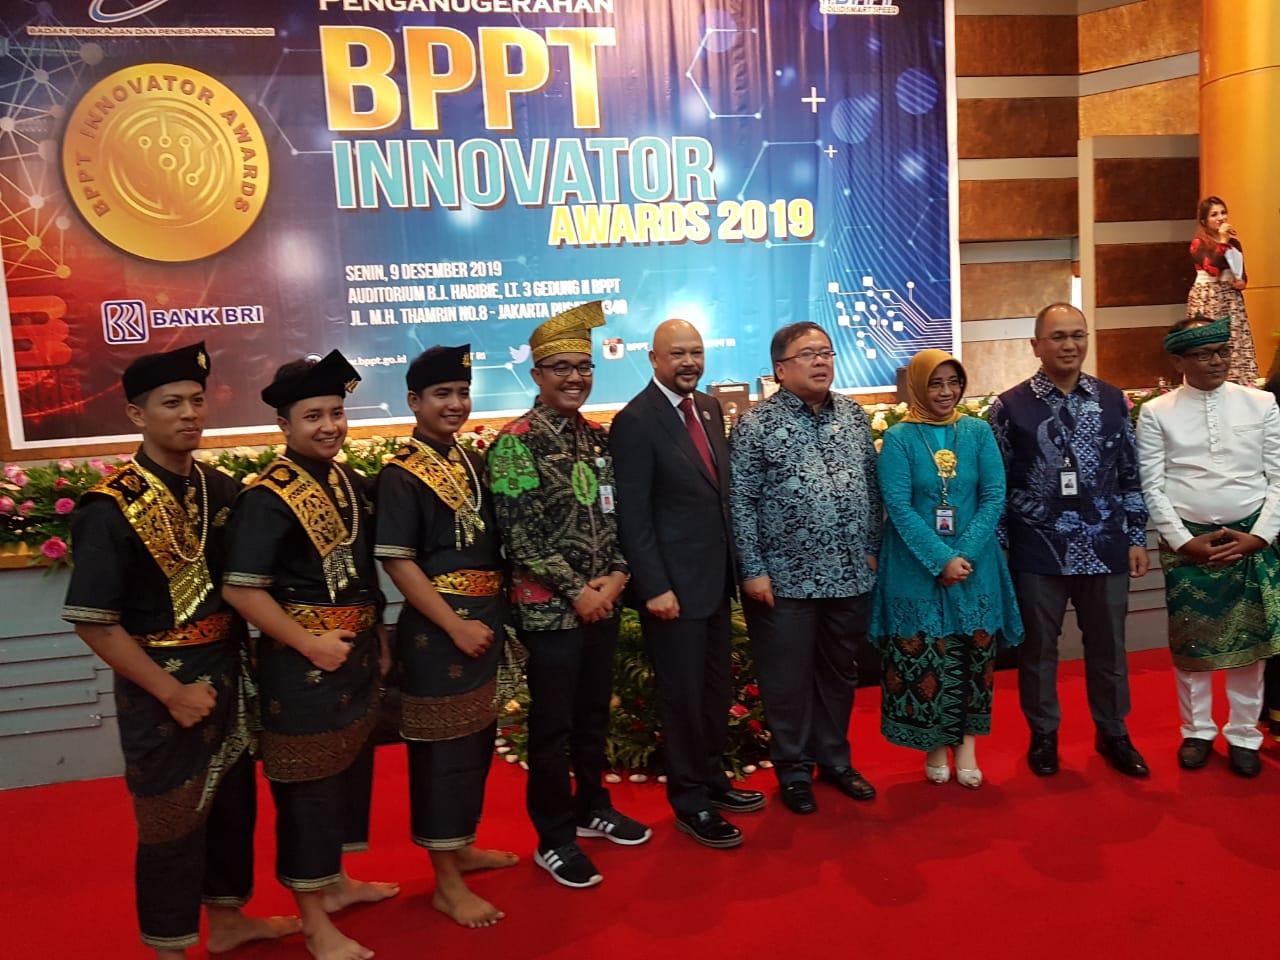 Menteri Riset dan Teknologi, Bambang Brodjonegoro Kepala Dinas Parbudpora Anharizal bersama Tim Kesenian Kabupaten Bengkalis pada ajang Penganugerahan BPPT Awards 2019